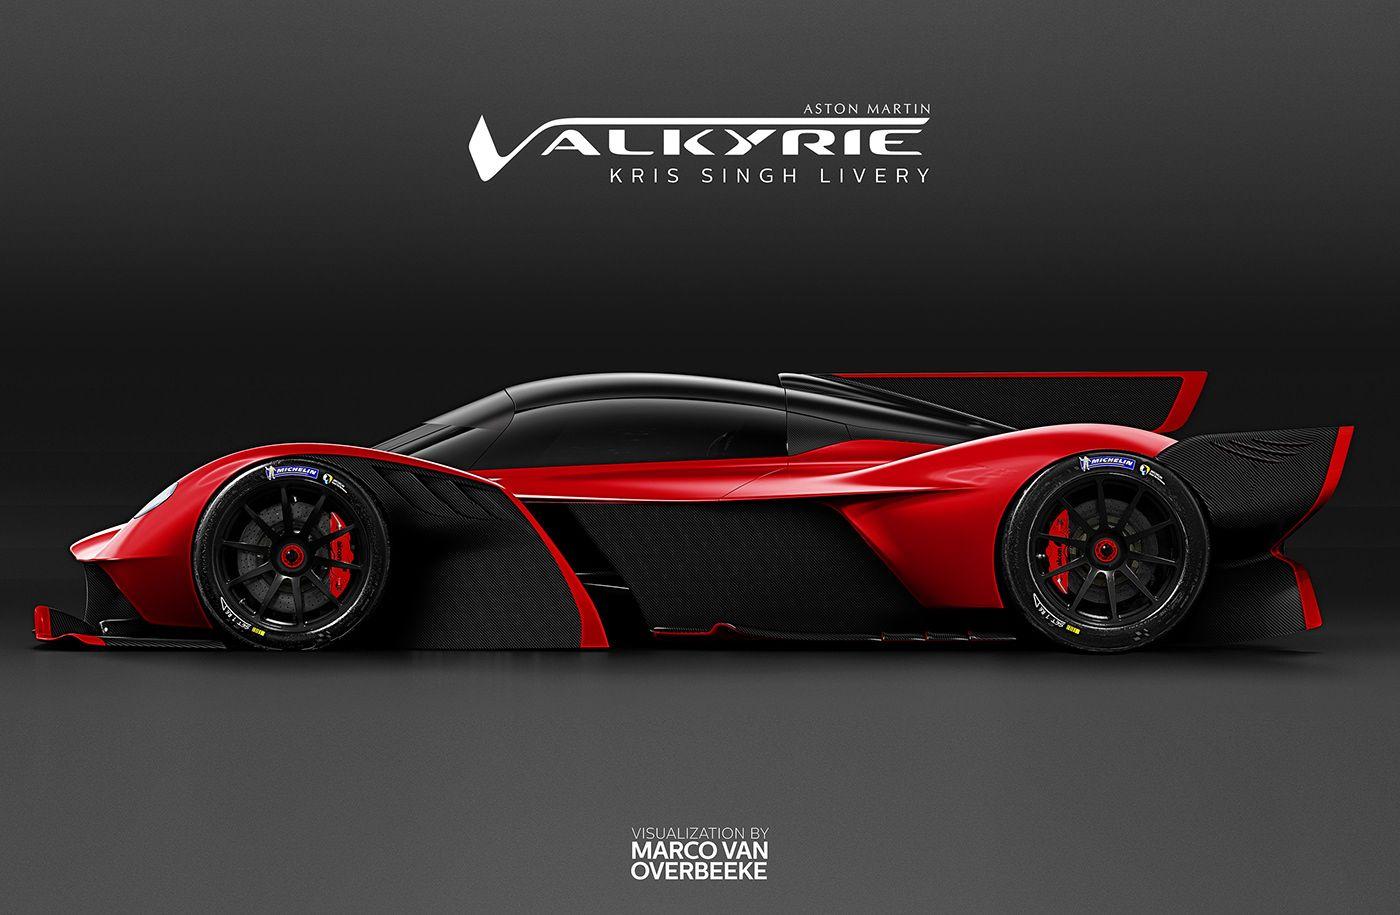 Aston Martin Valkyrie Kris Singh Custom Spec On Behance Aston